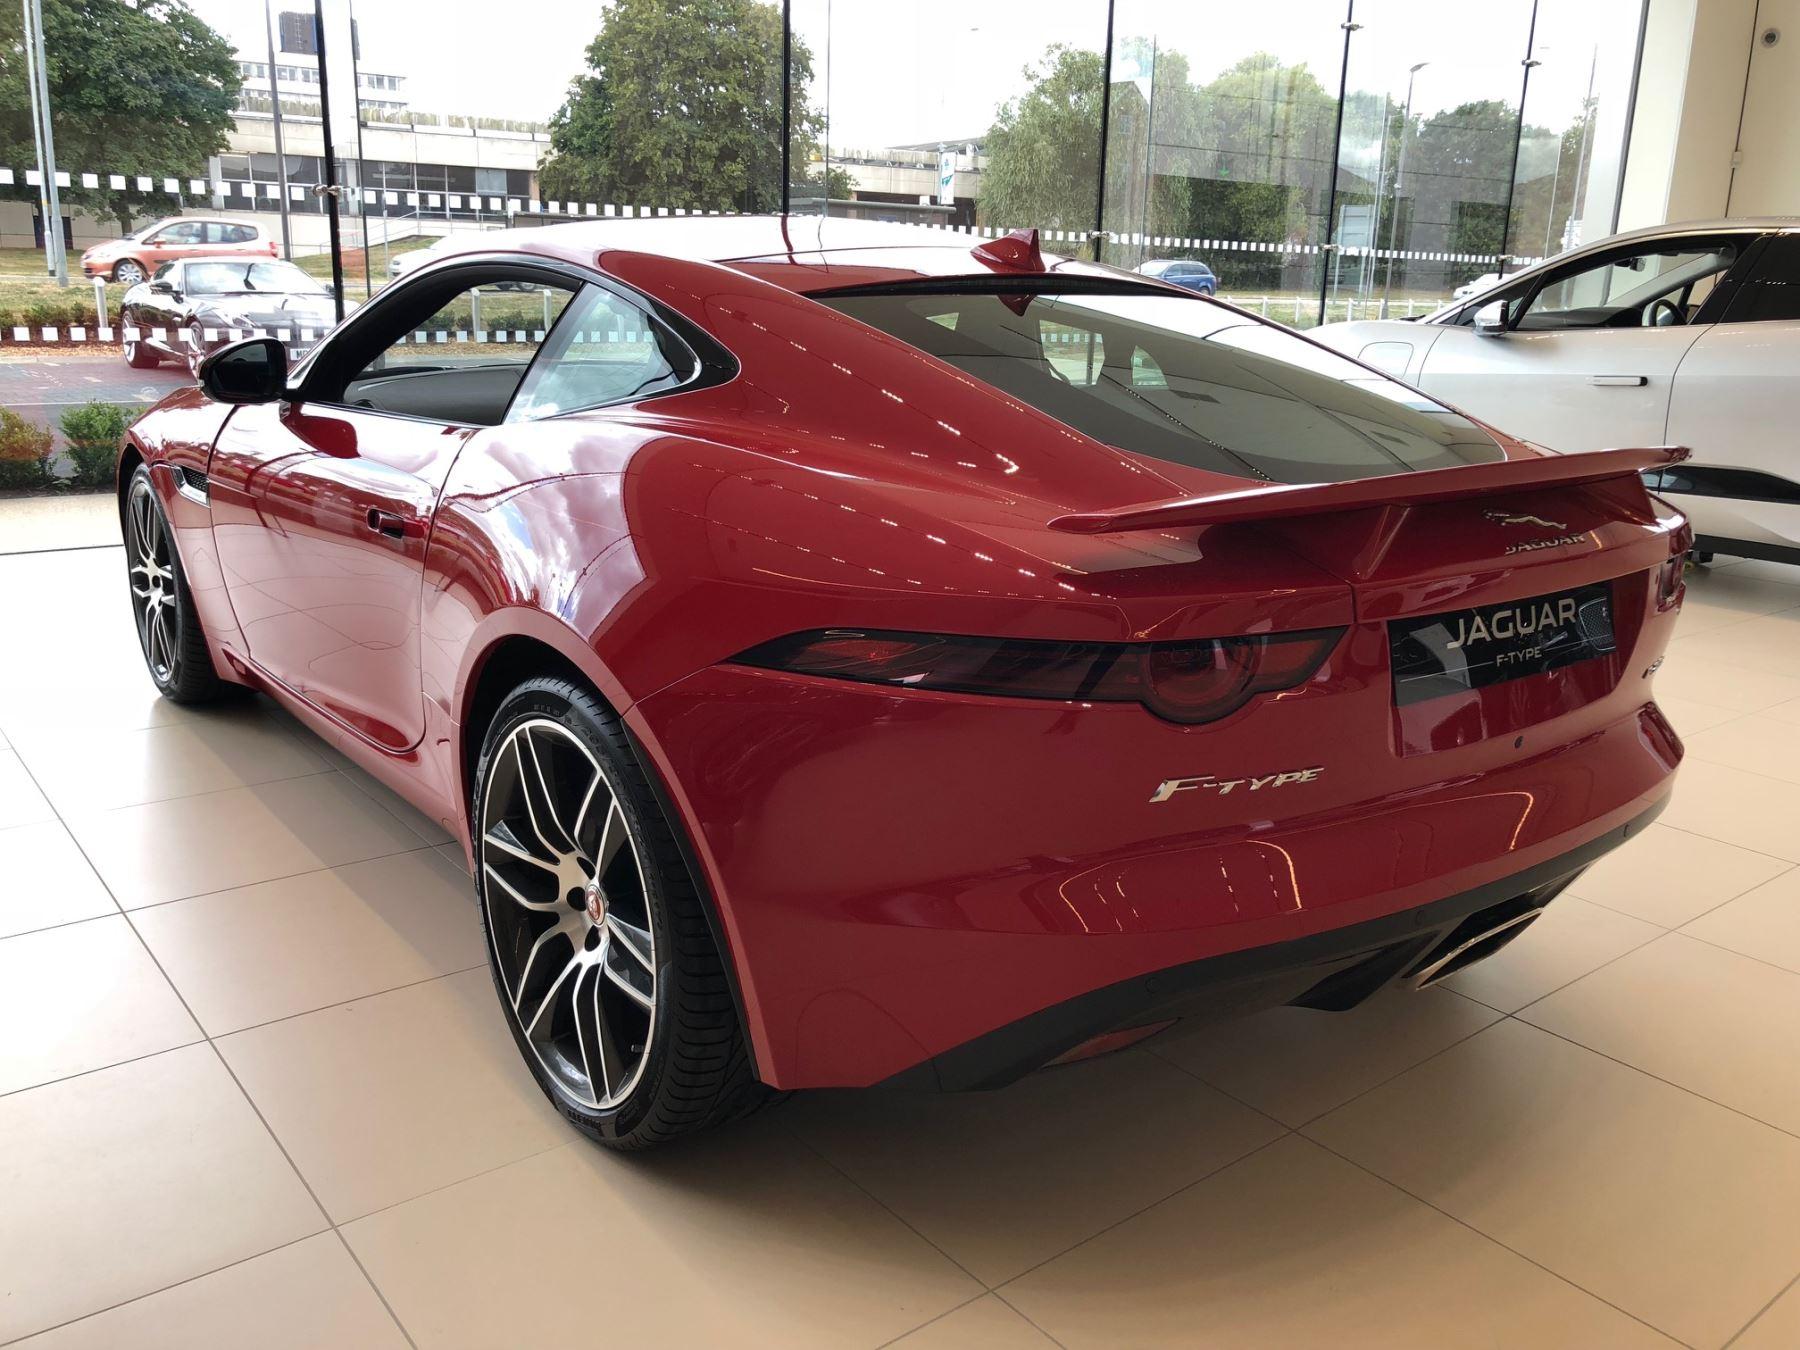 Jaguar F-TYPE 2.0 300PS RWD R-Dynamic image 7